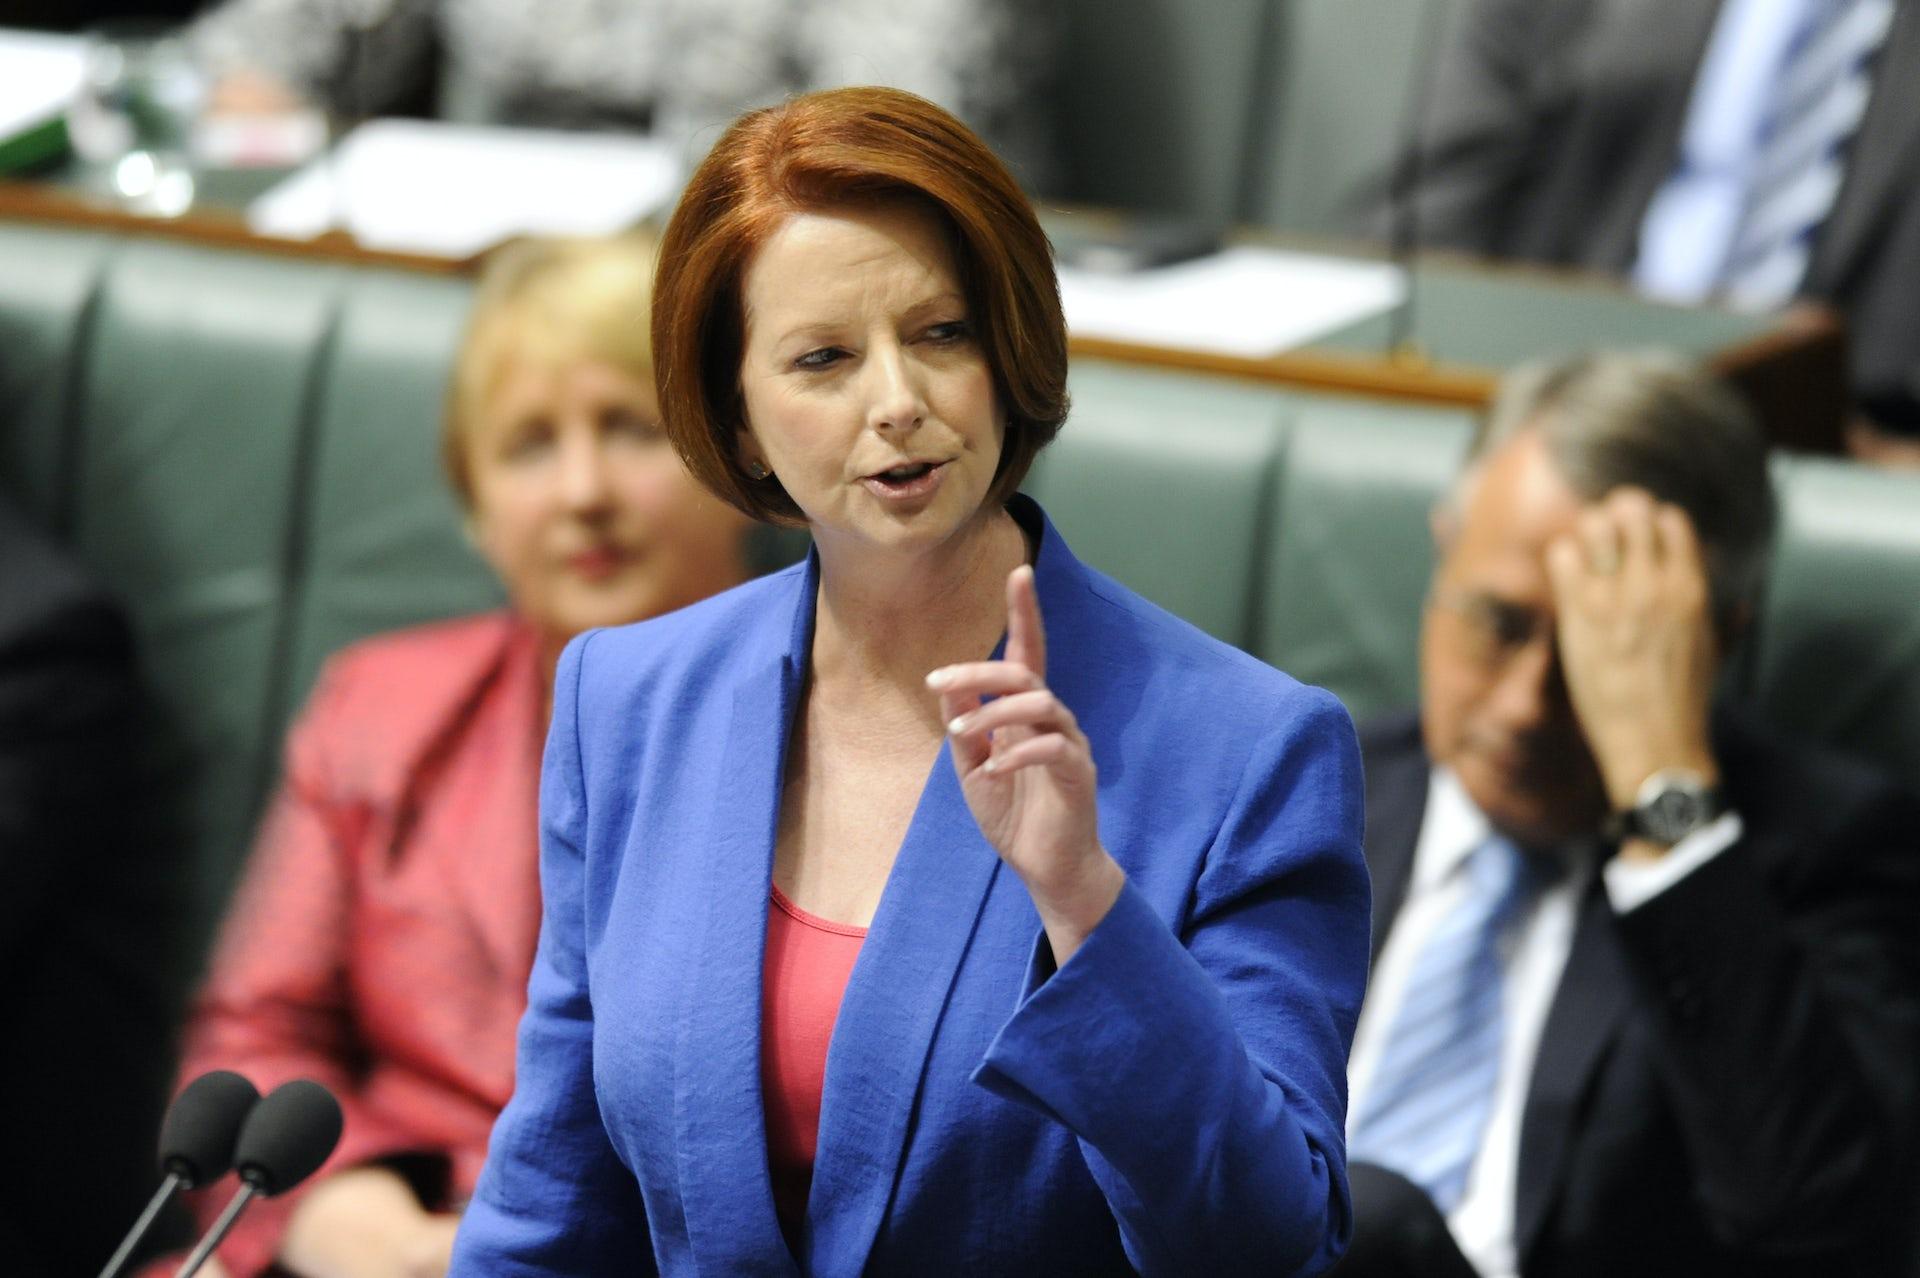 Julia Gillard nudes (11 fotos), video Paparazzi, YouTube, butt 2018